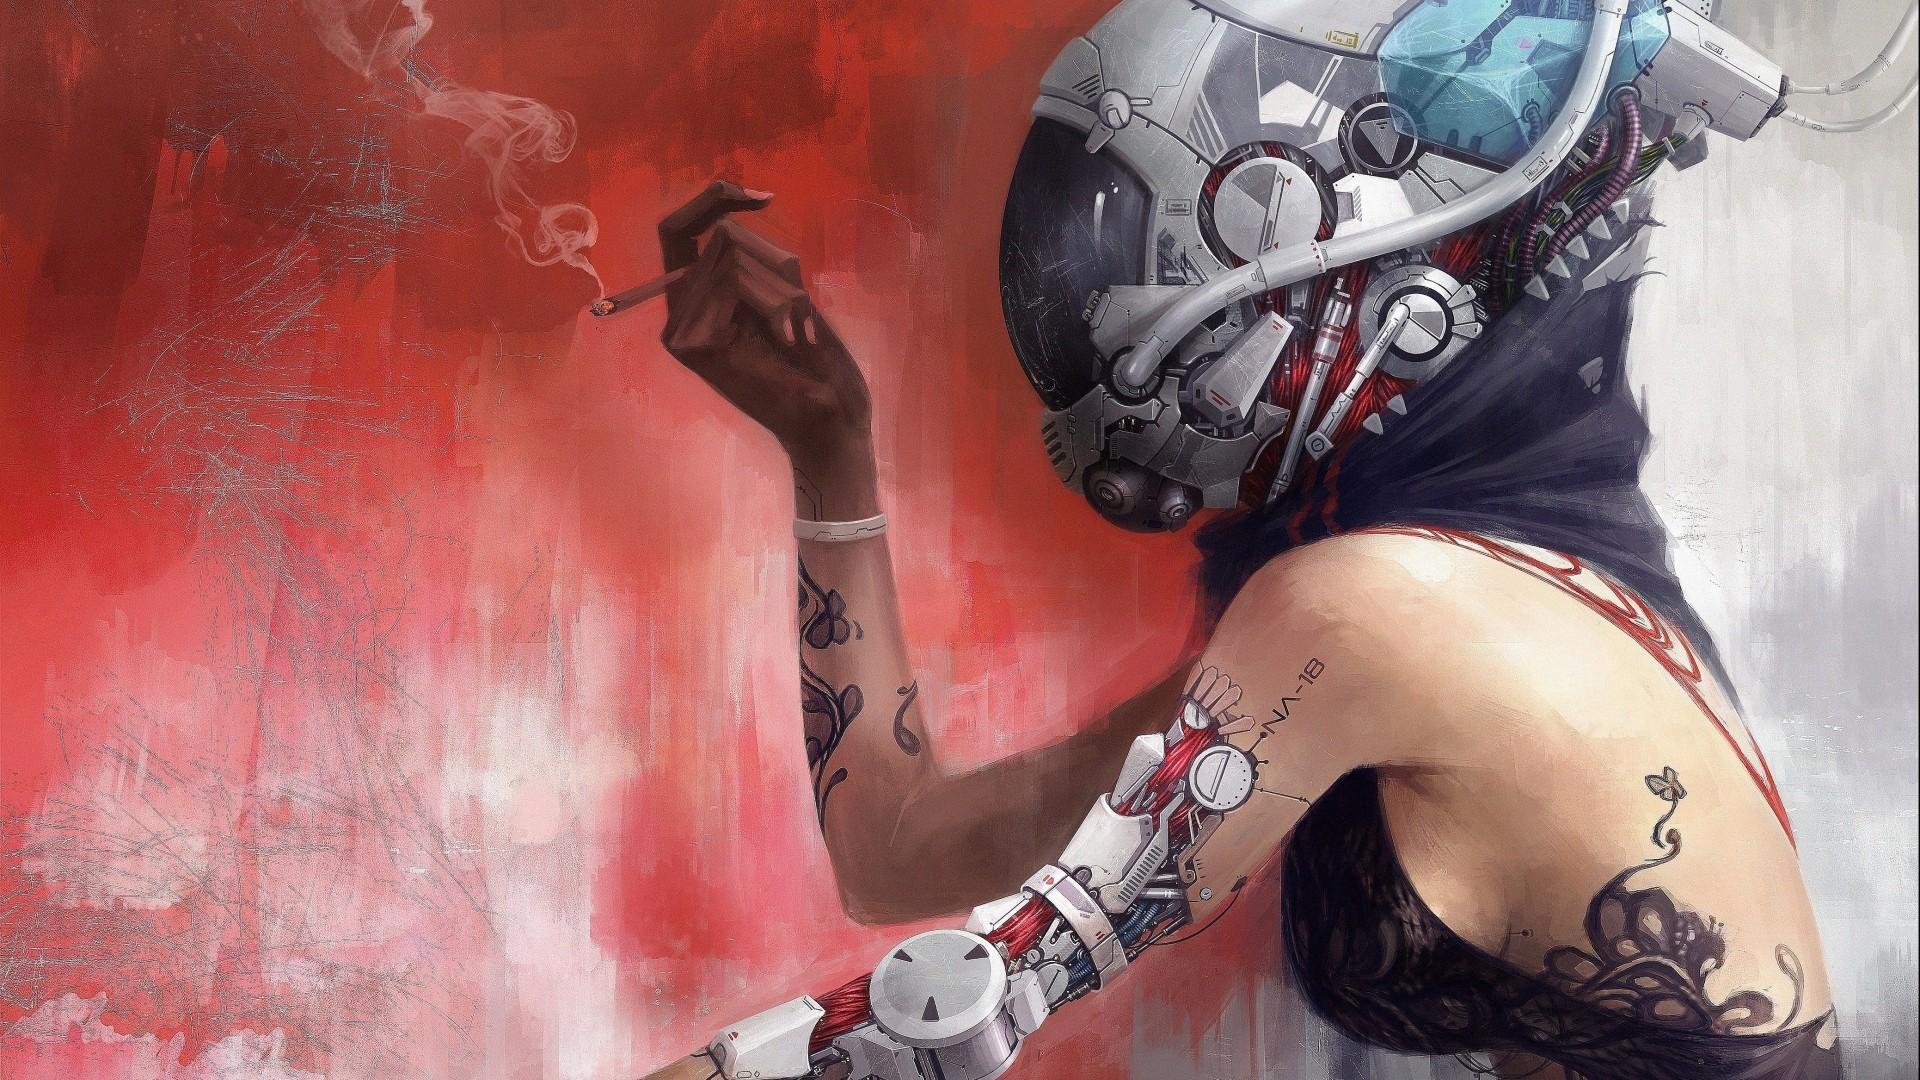 General 1920x1080 cyborg technology cigarettes bare shoulders pipes tattoo bionics soft shading digital art wires smoke cyberpunk futuristic helmet sideboob fictional characters